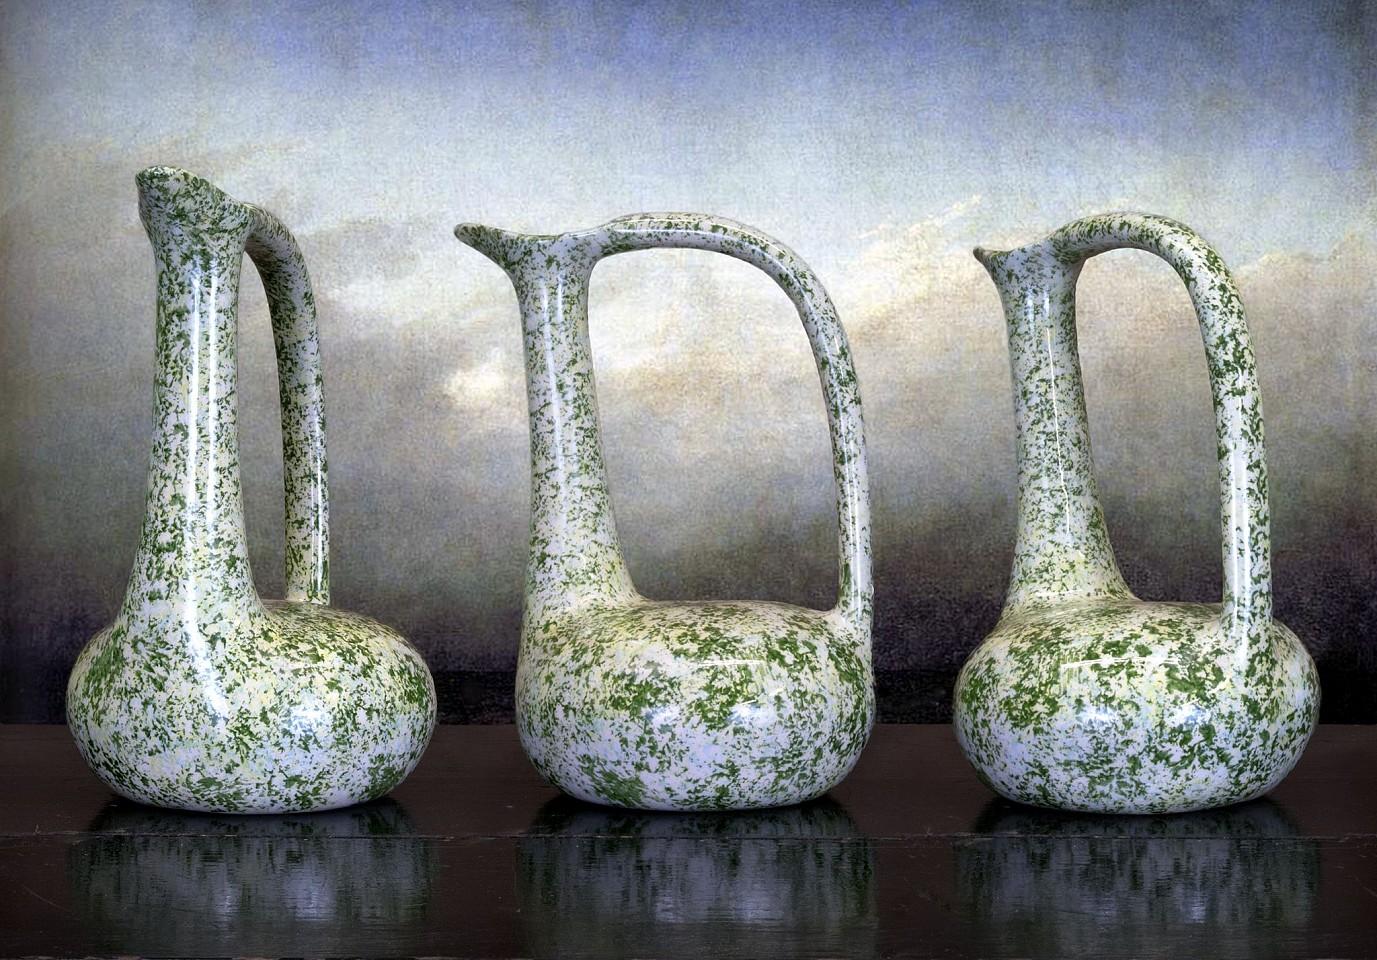 Oliver Wasow, Greek Vase 2015, Archival inkjet